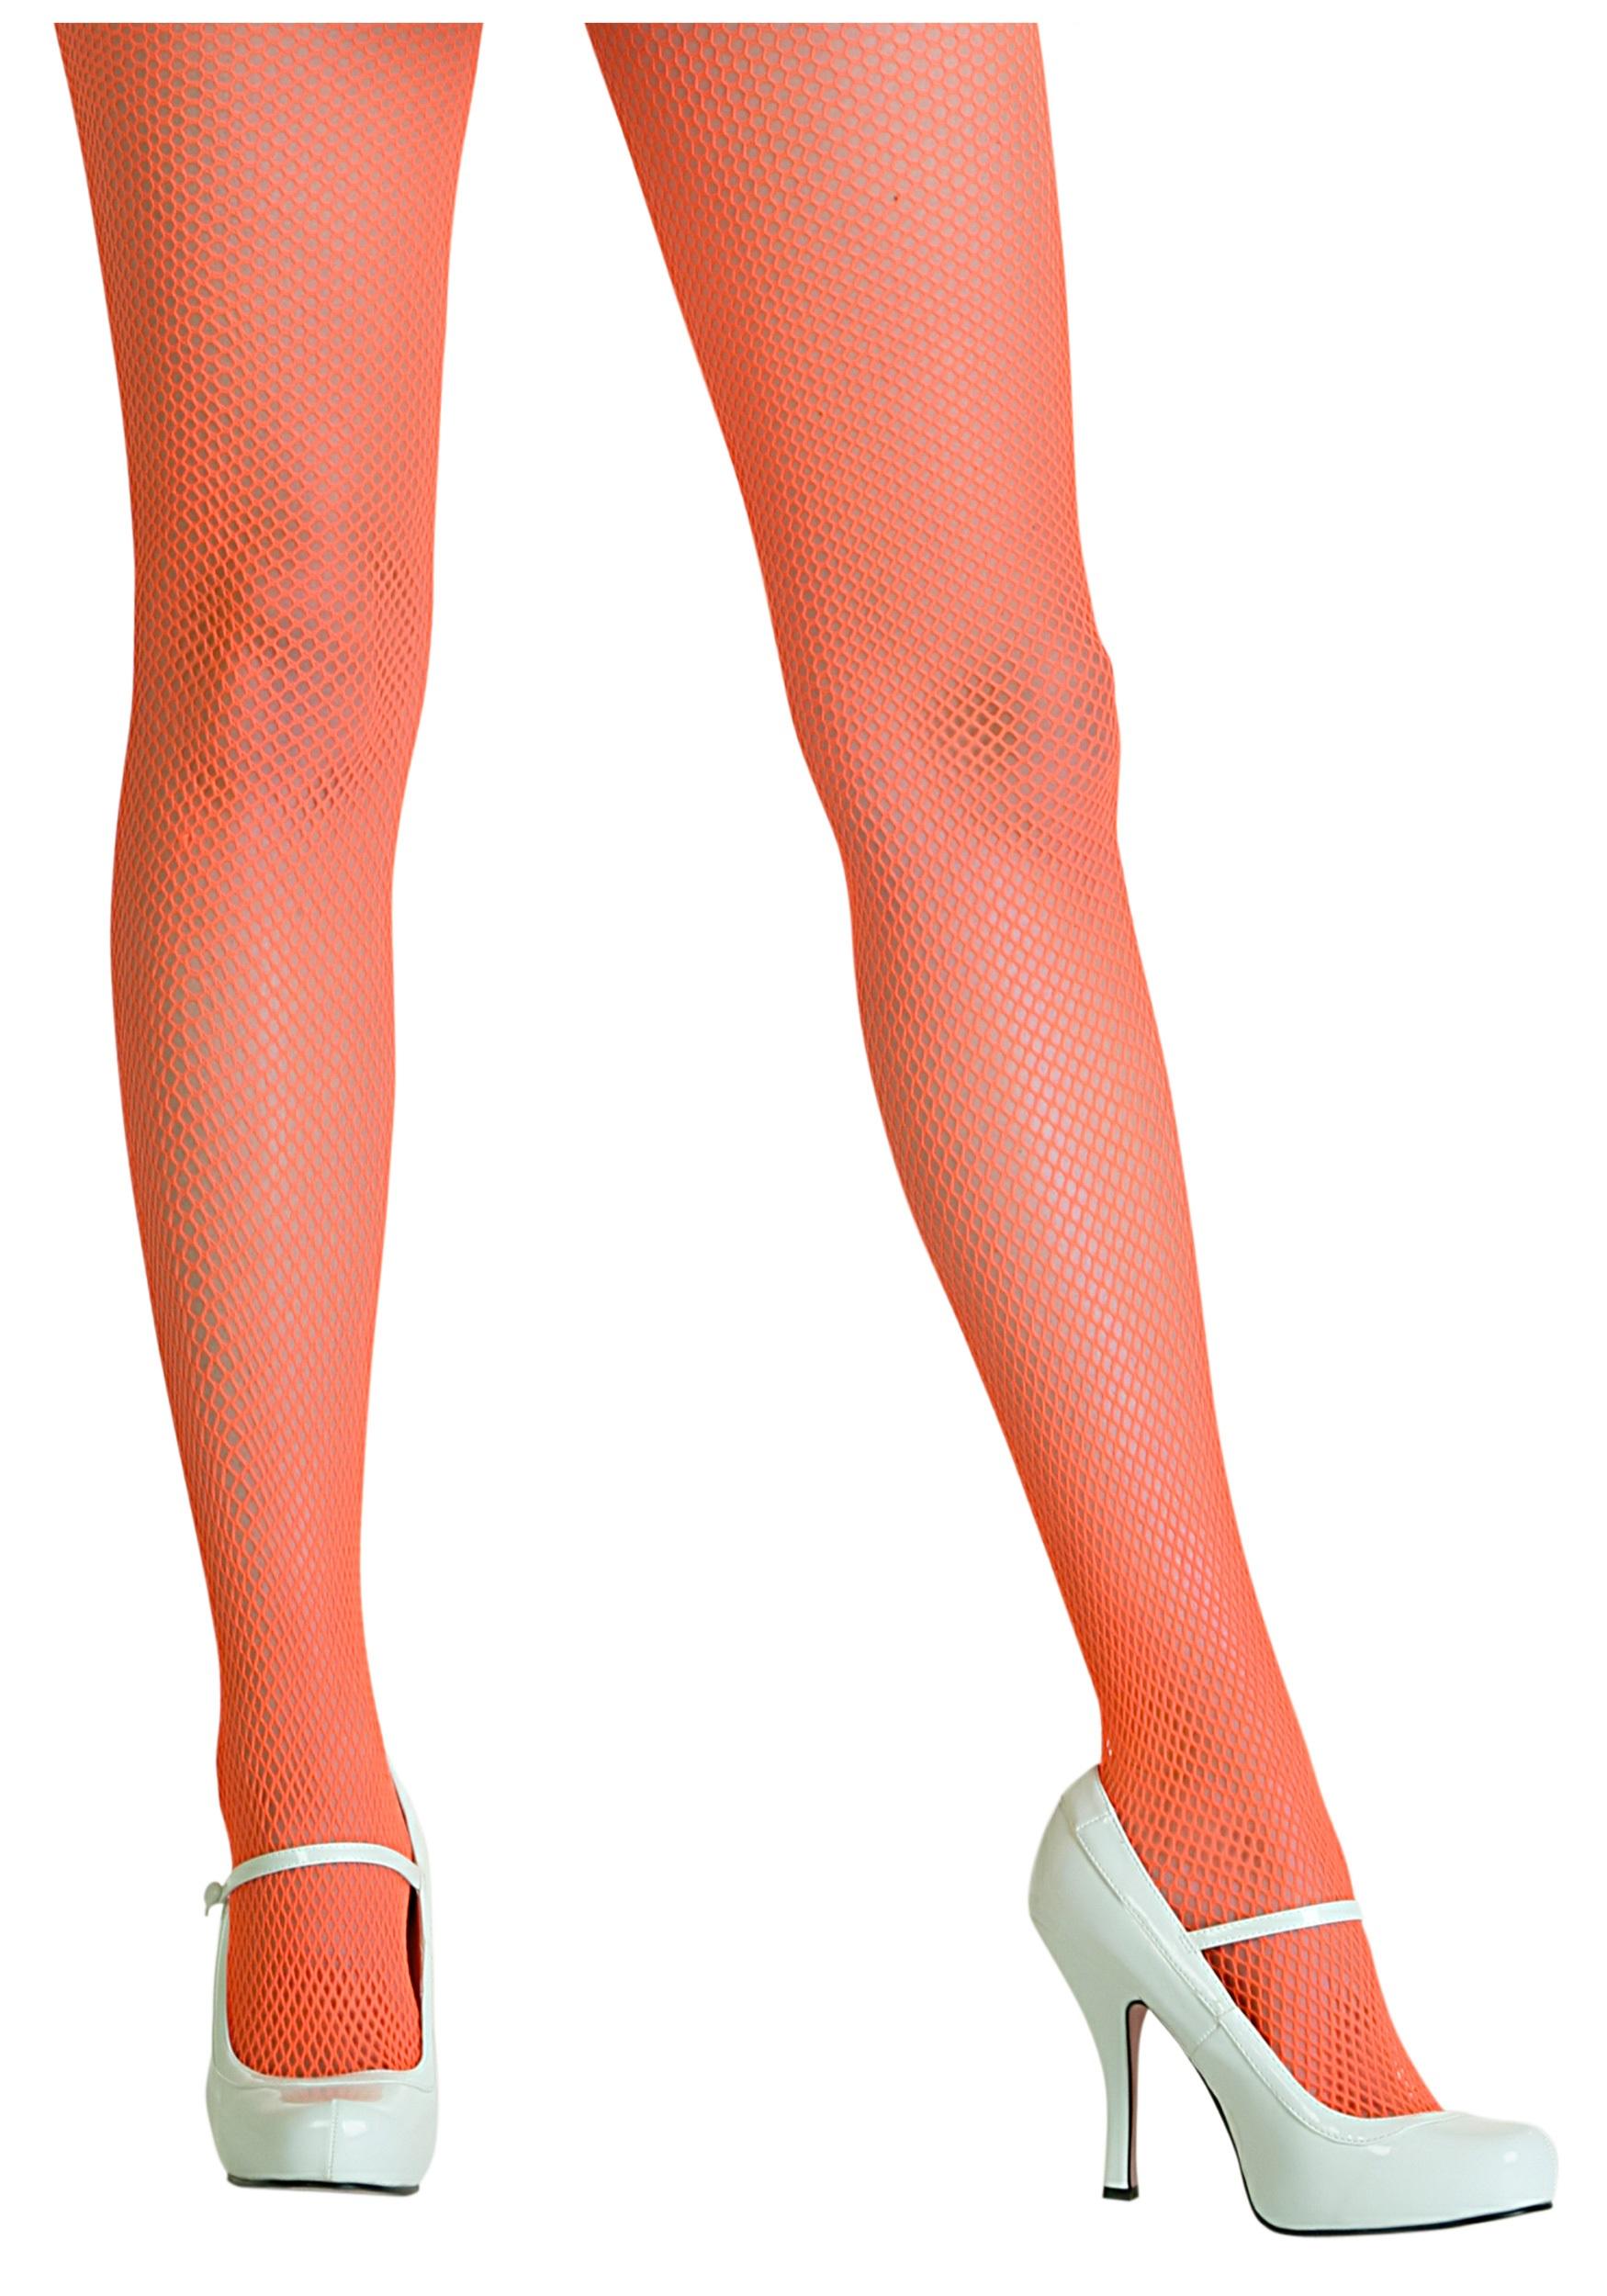 f54f536780cb6 80s Orange Fishnet Tights - Monster Costume Accessories